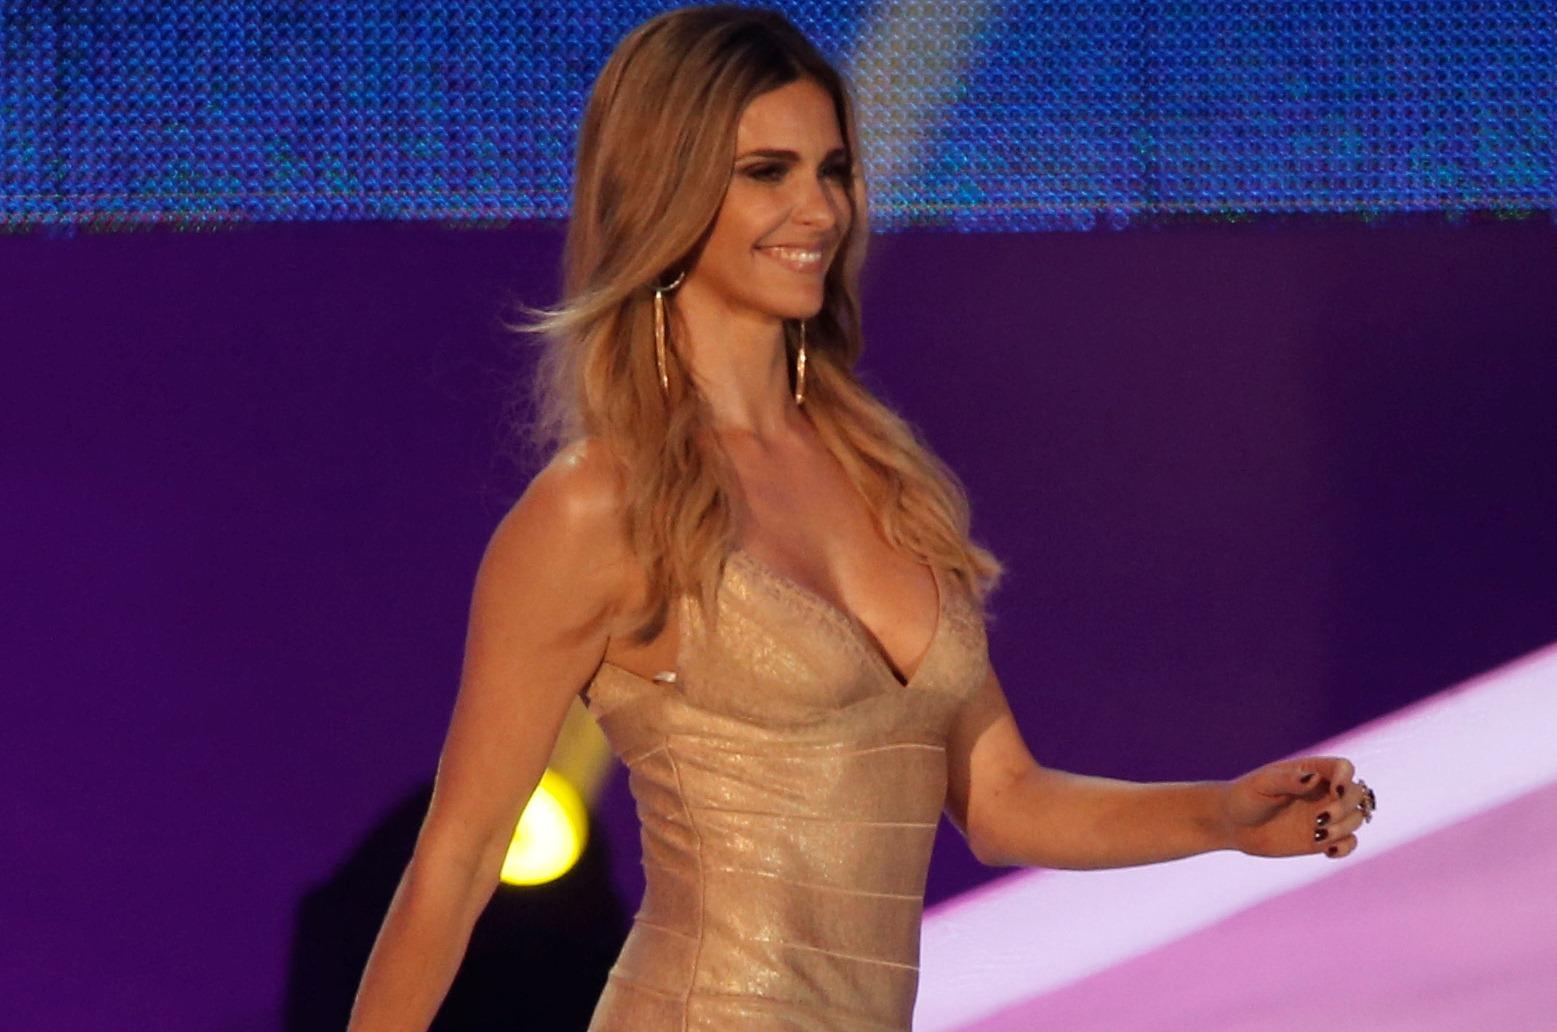 Фернанда Лима на церемонии жеребьевки ЧМ-2014